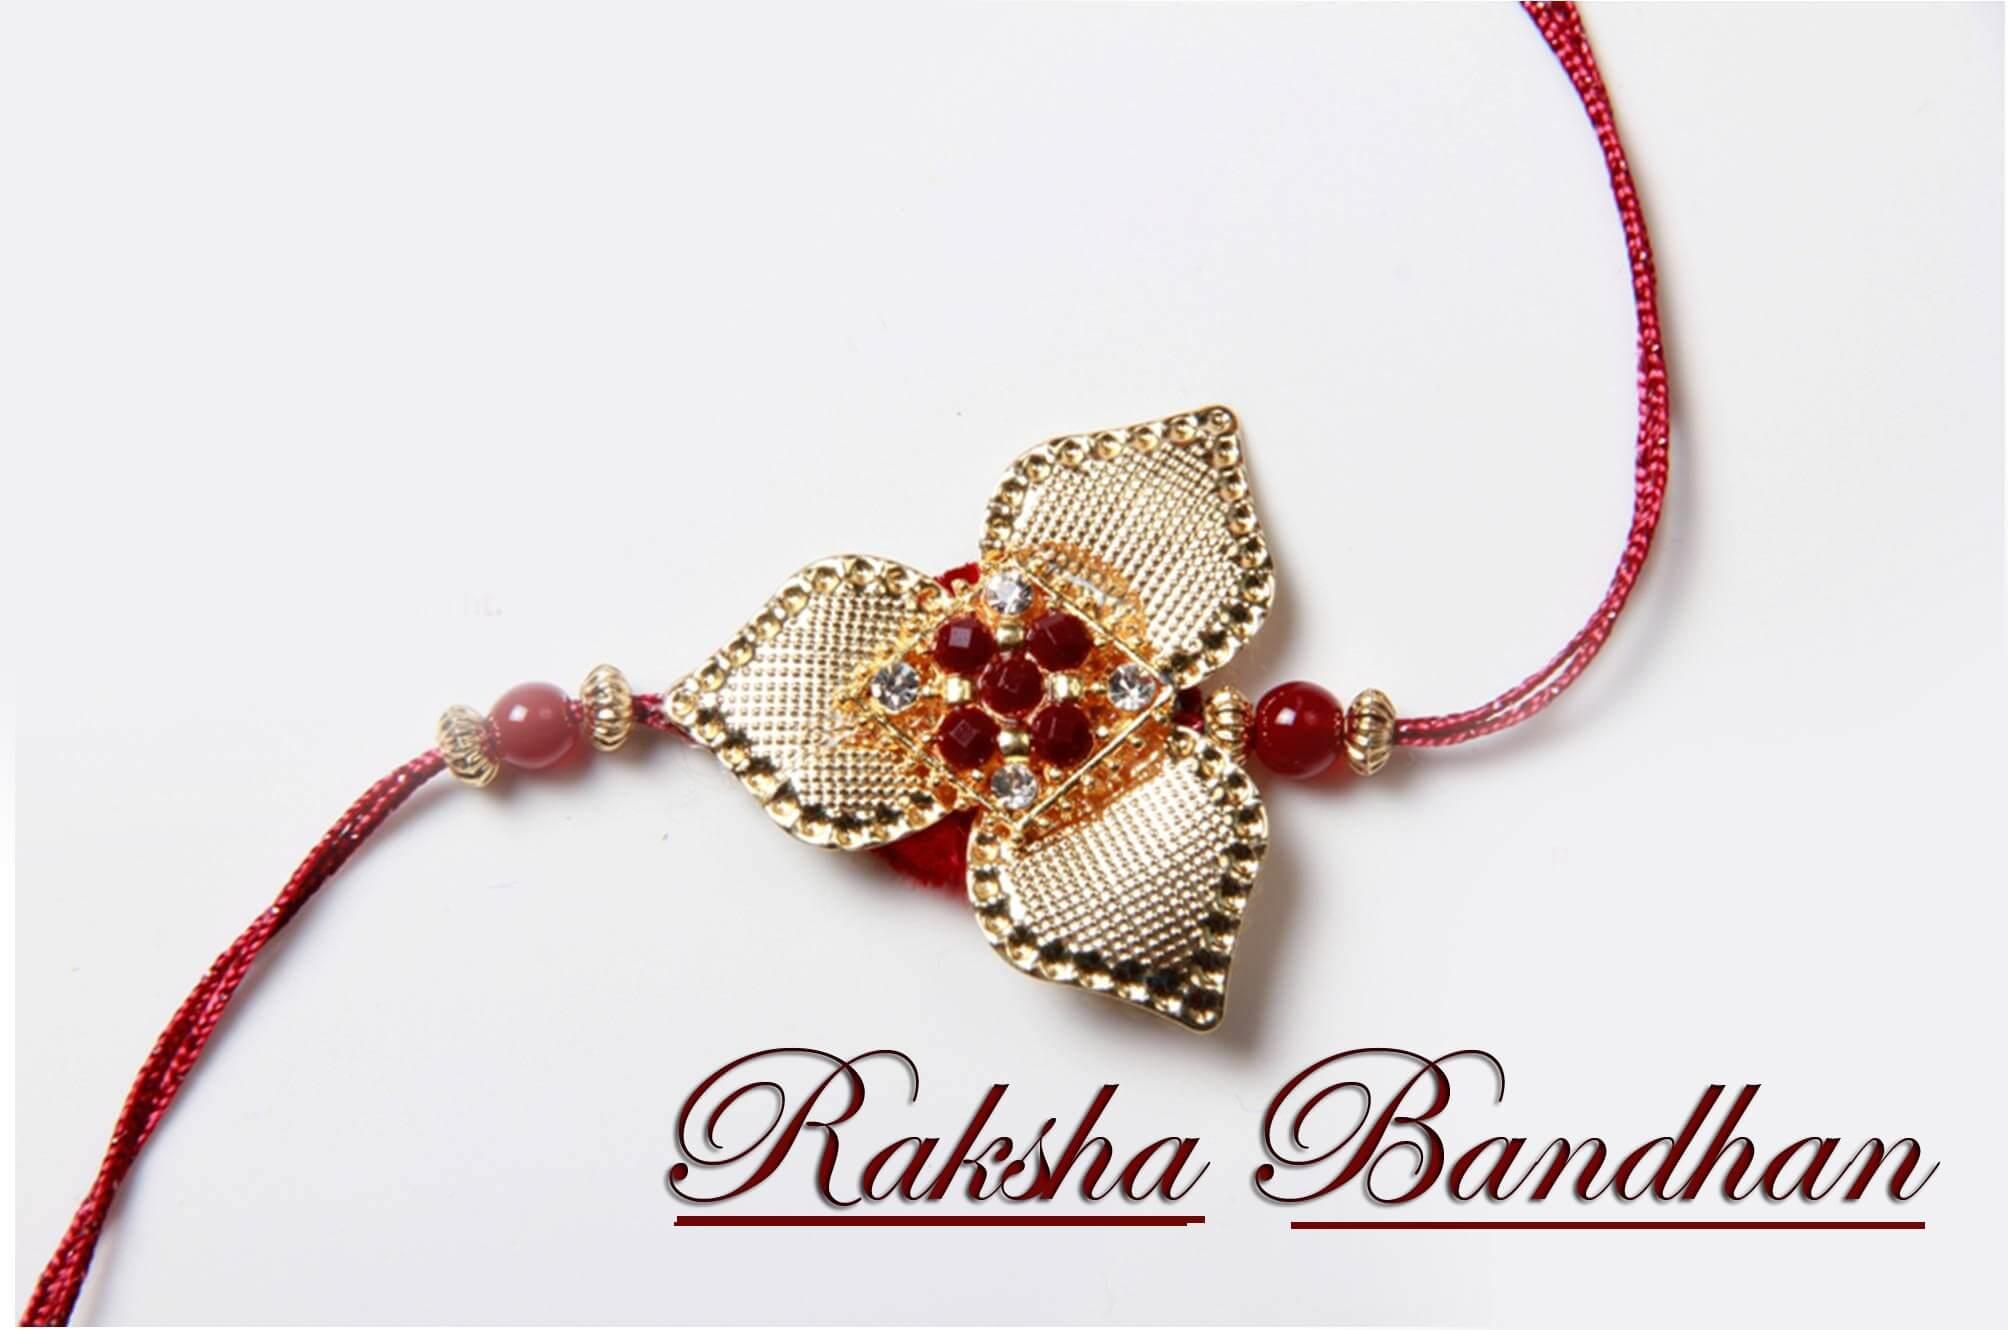 happy raksha bandhan rakhi greetings wishes hd wallpaper